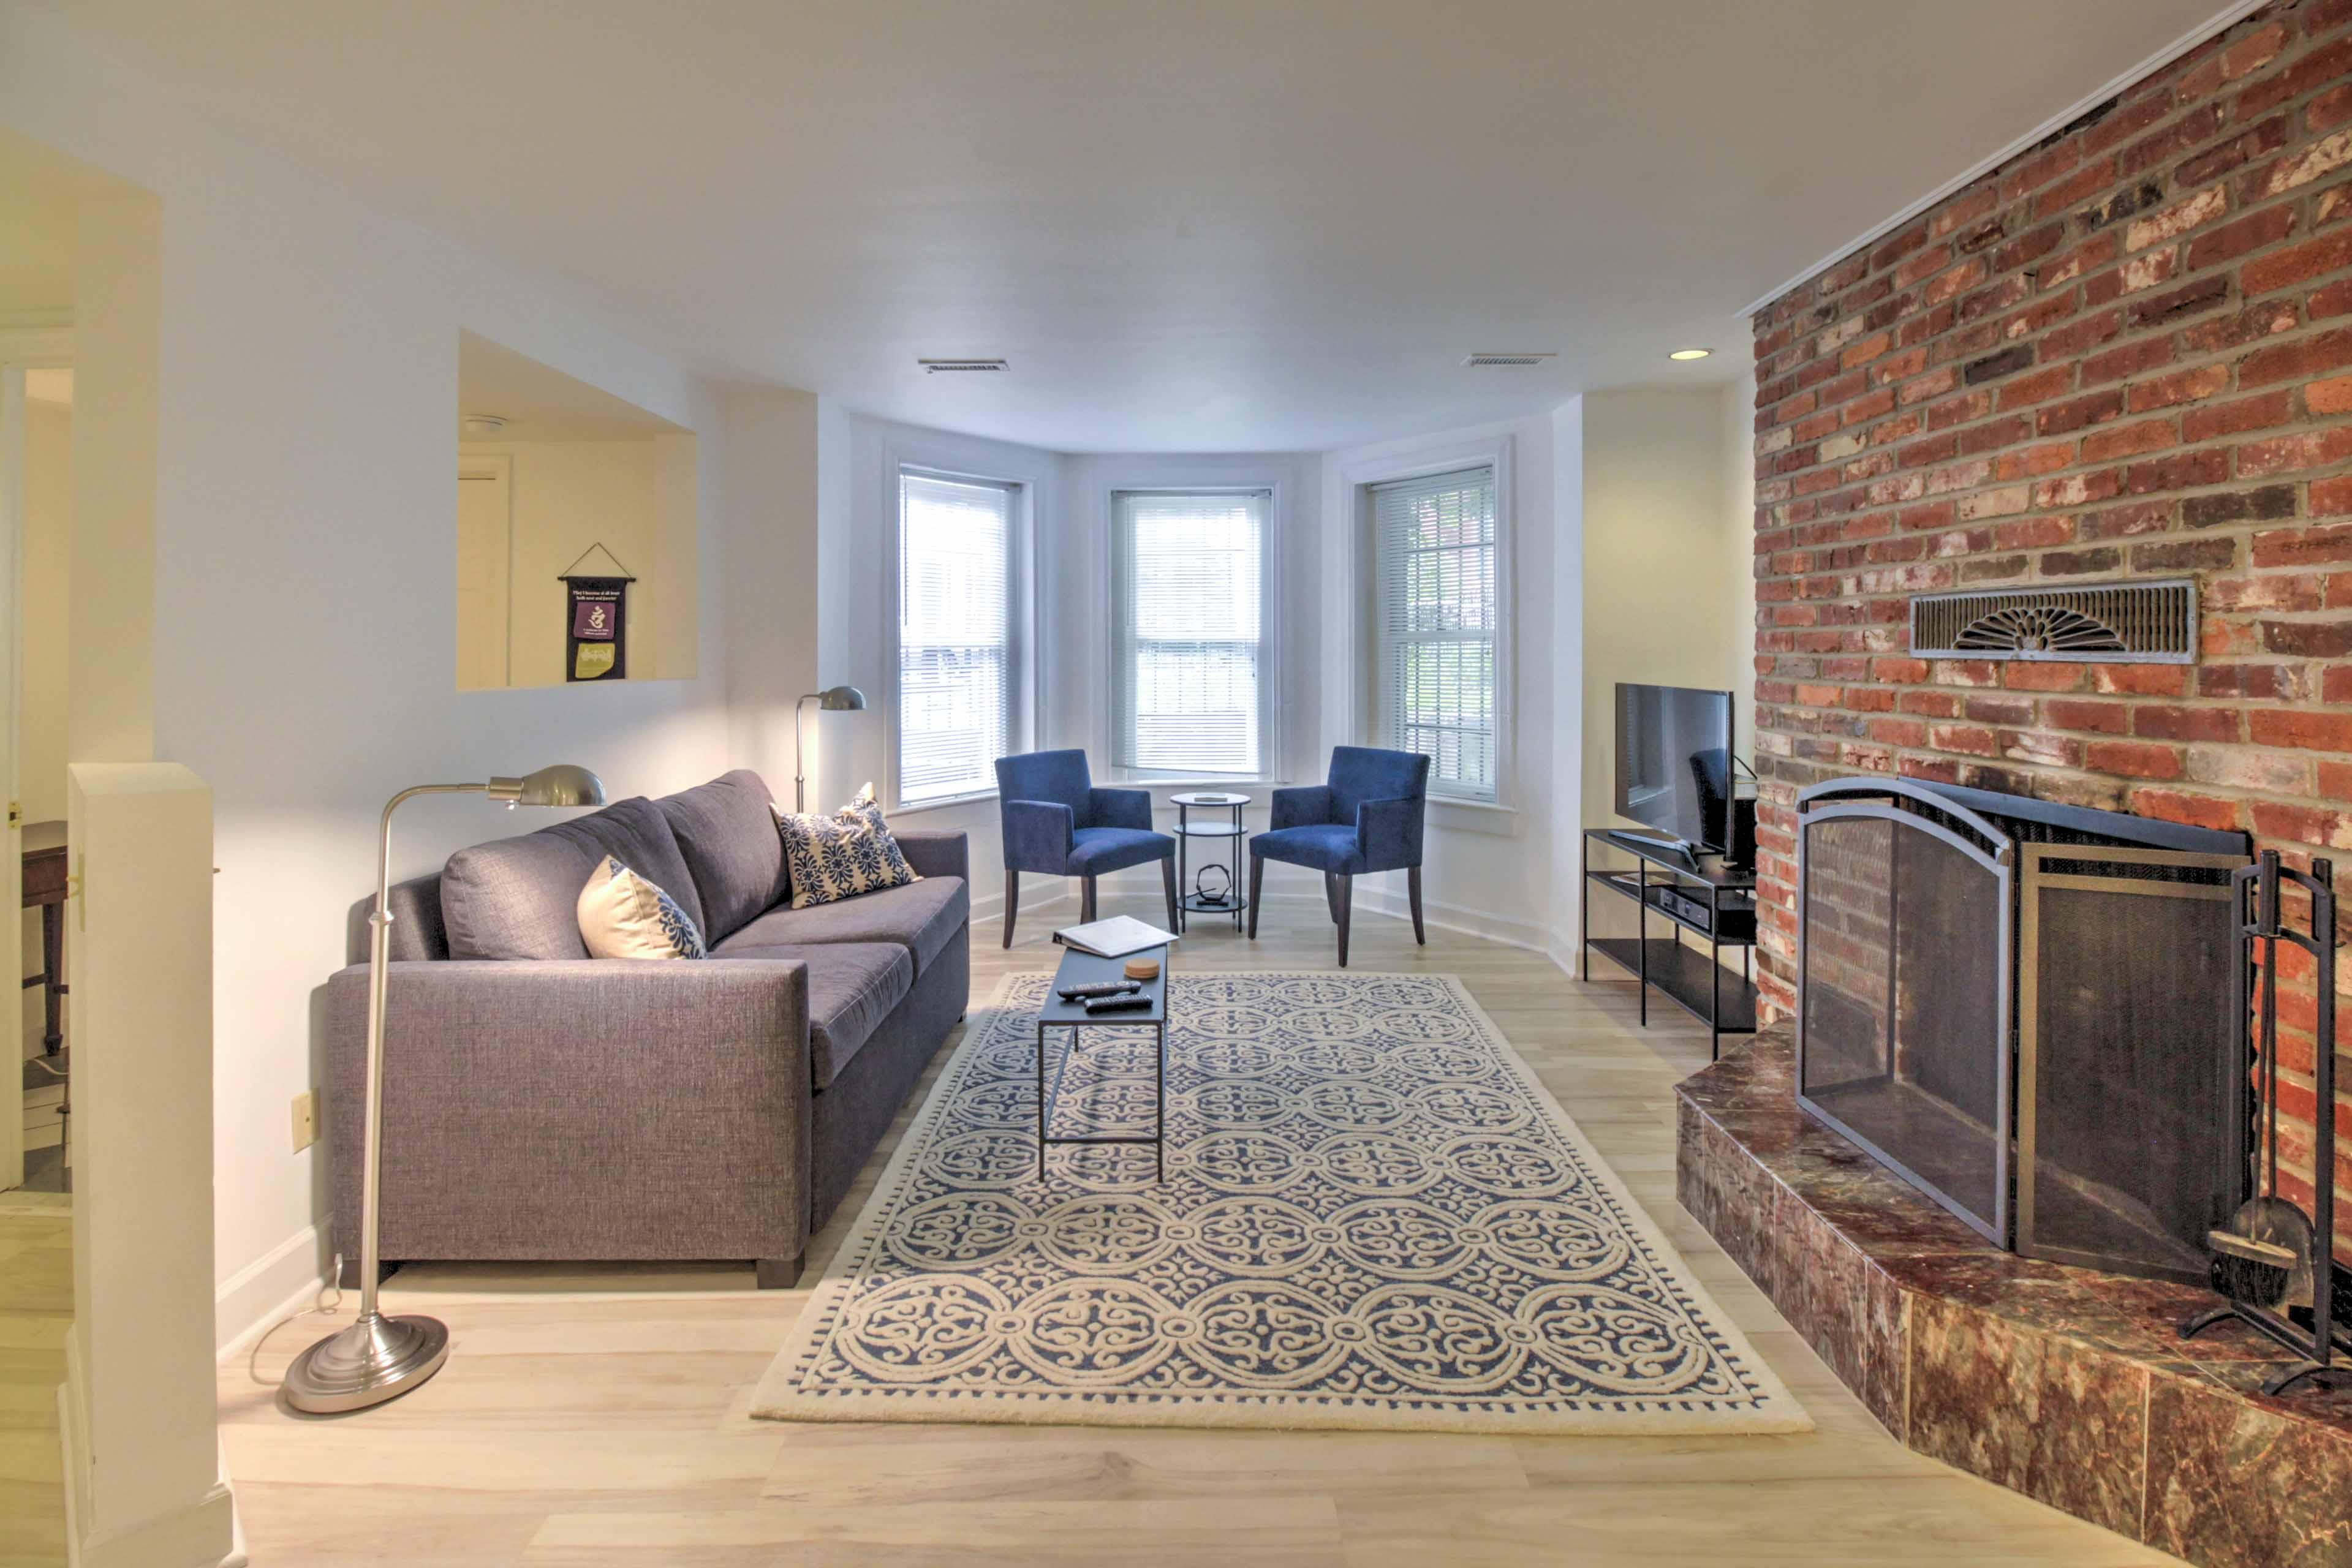 A memorable retreat awaits you at this 1-bed, 1-bath vacation rental apartment.